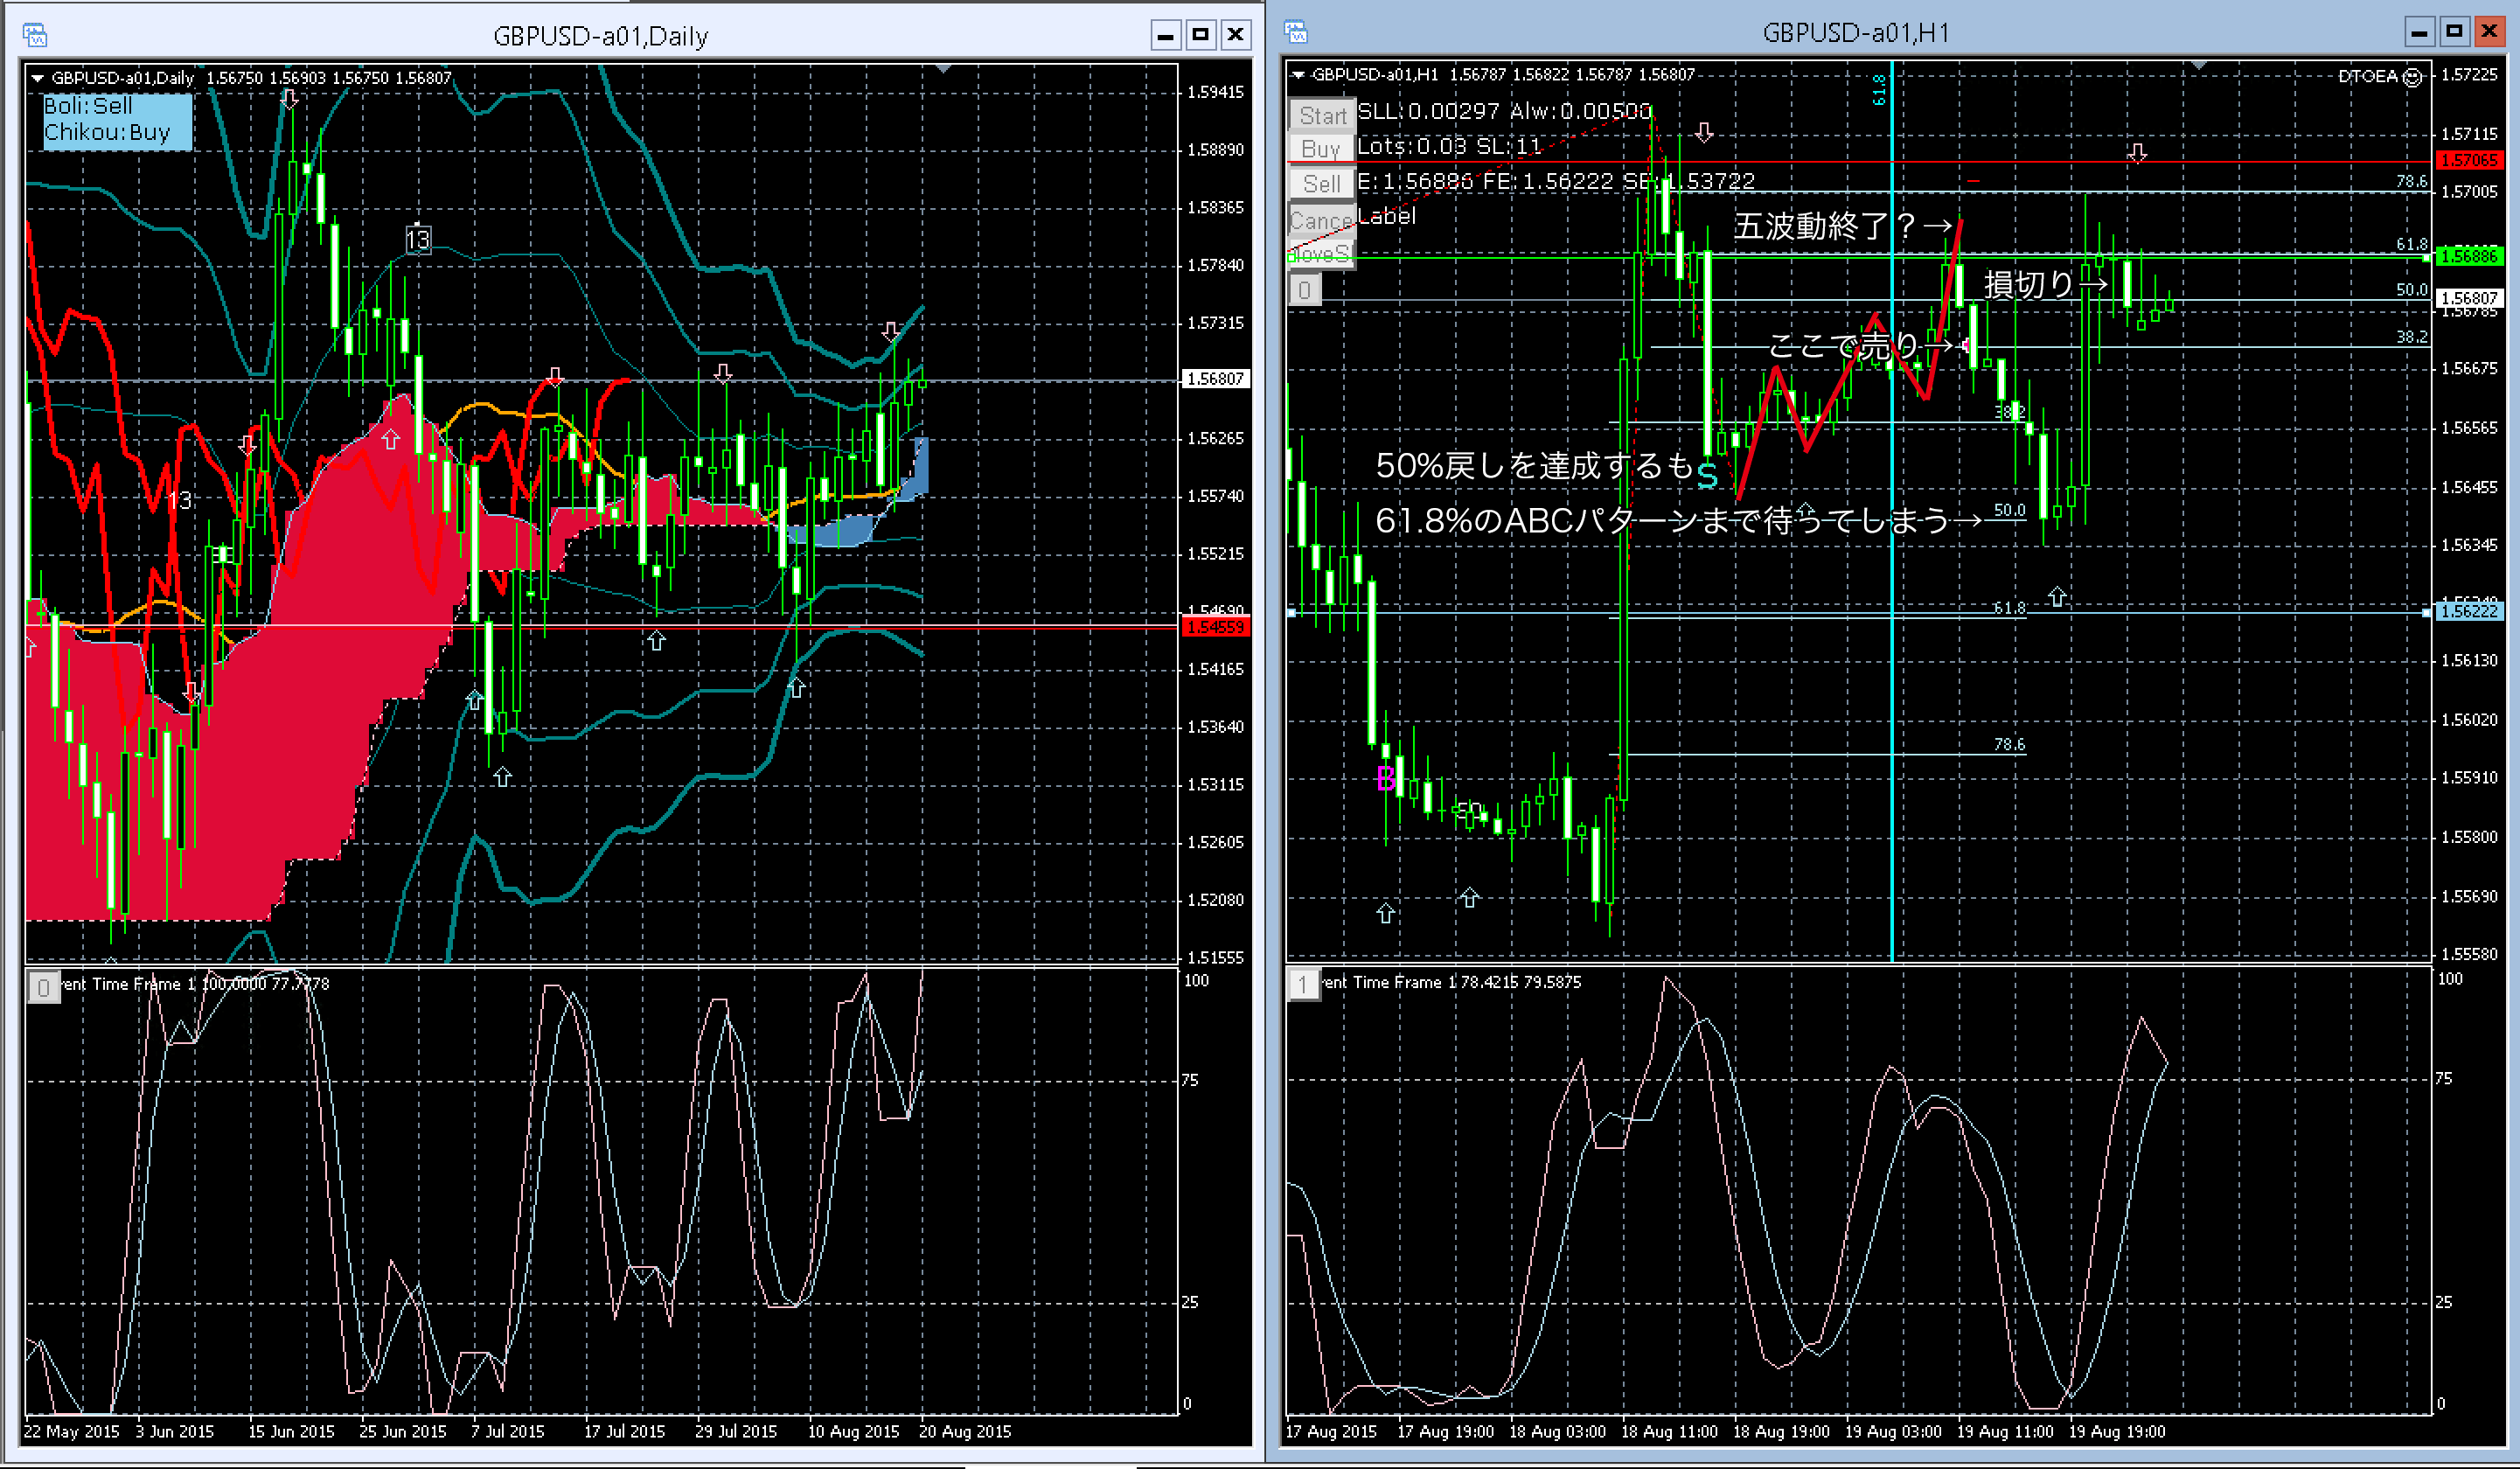 2015-08-20-8.18.39